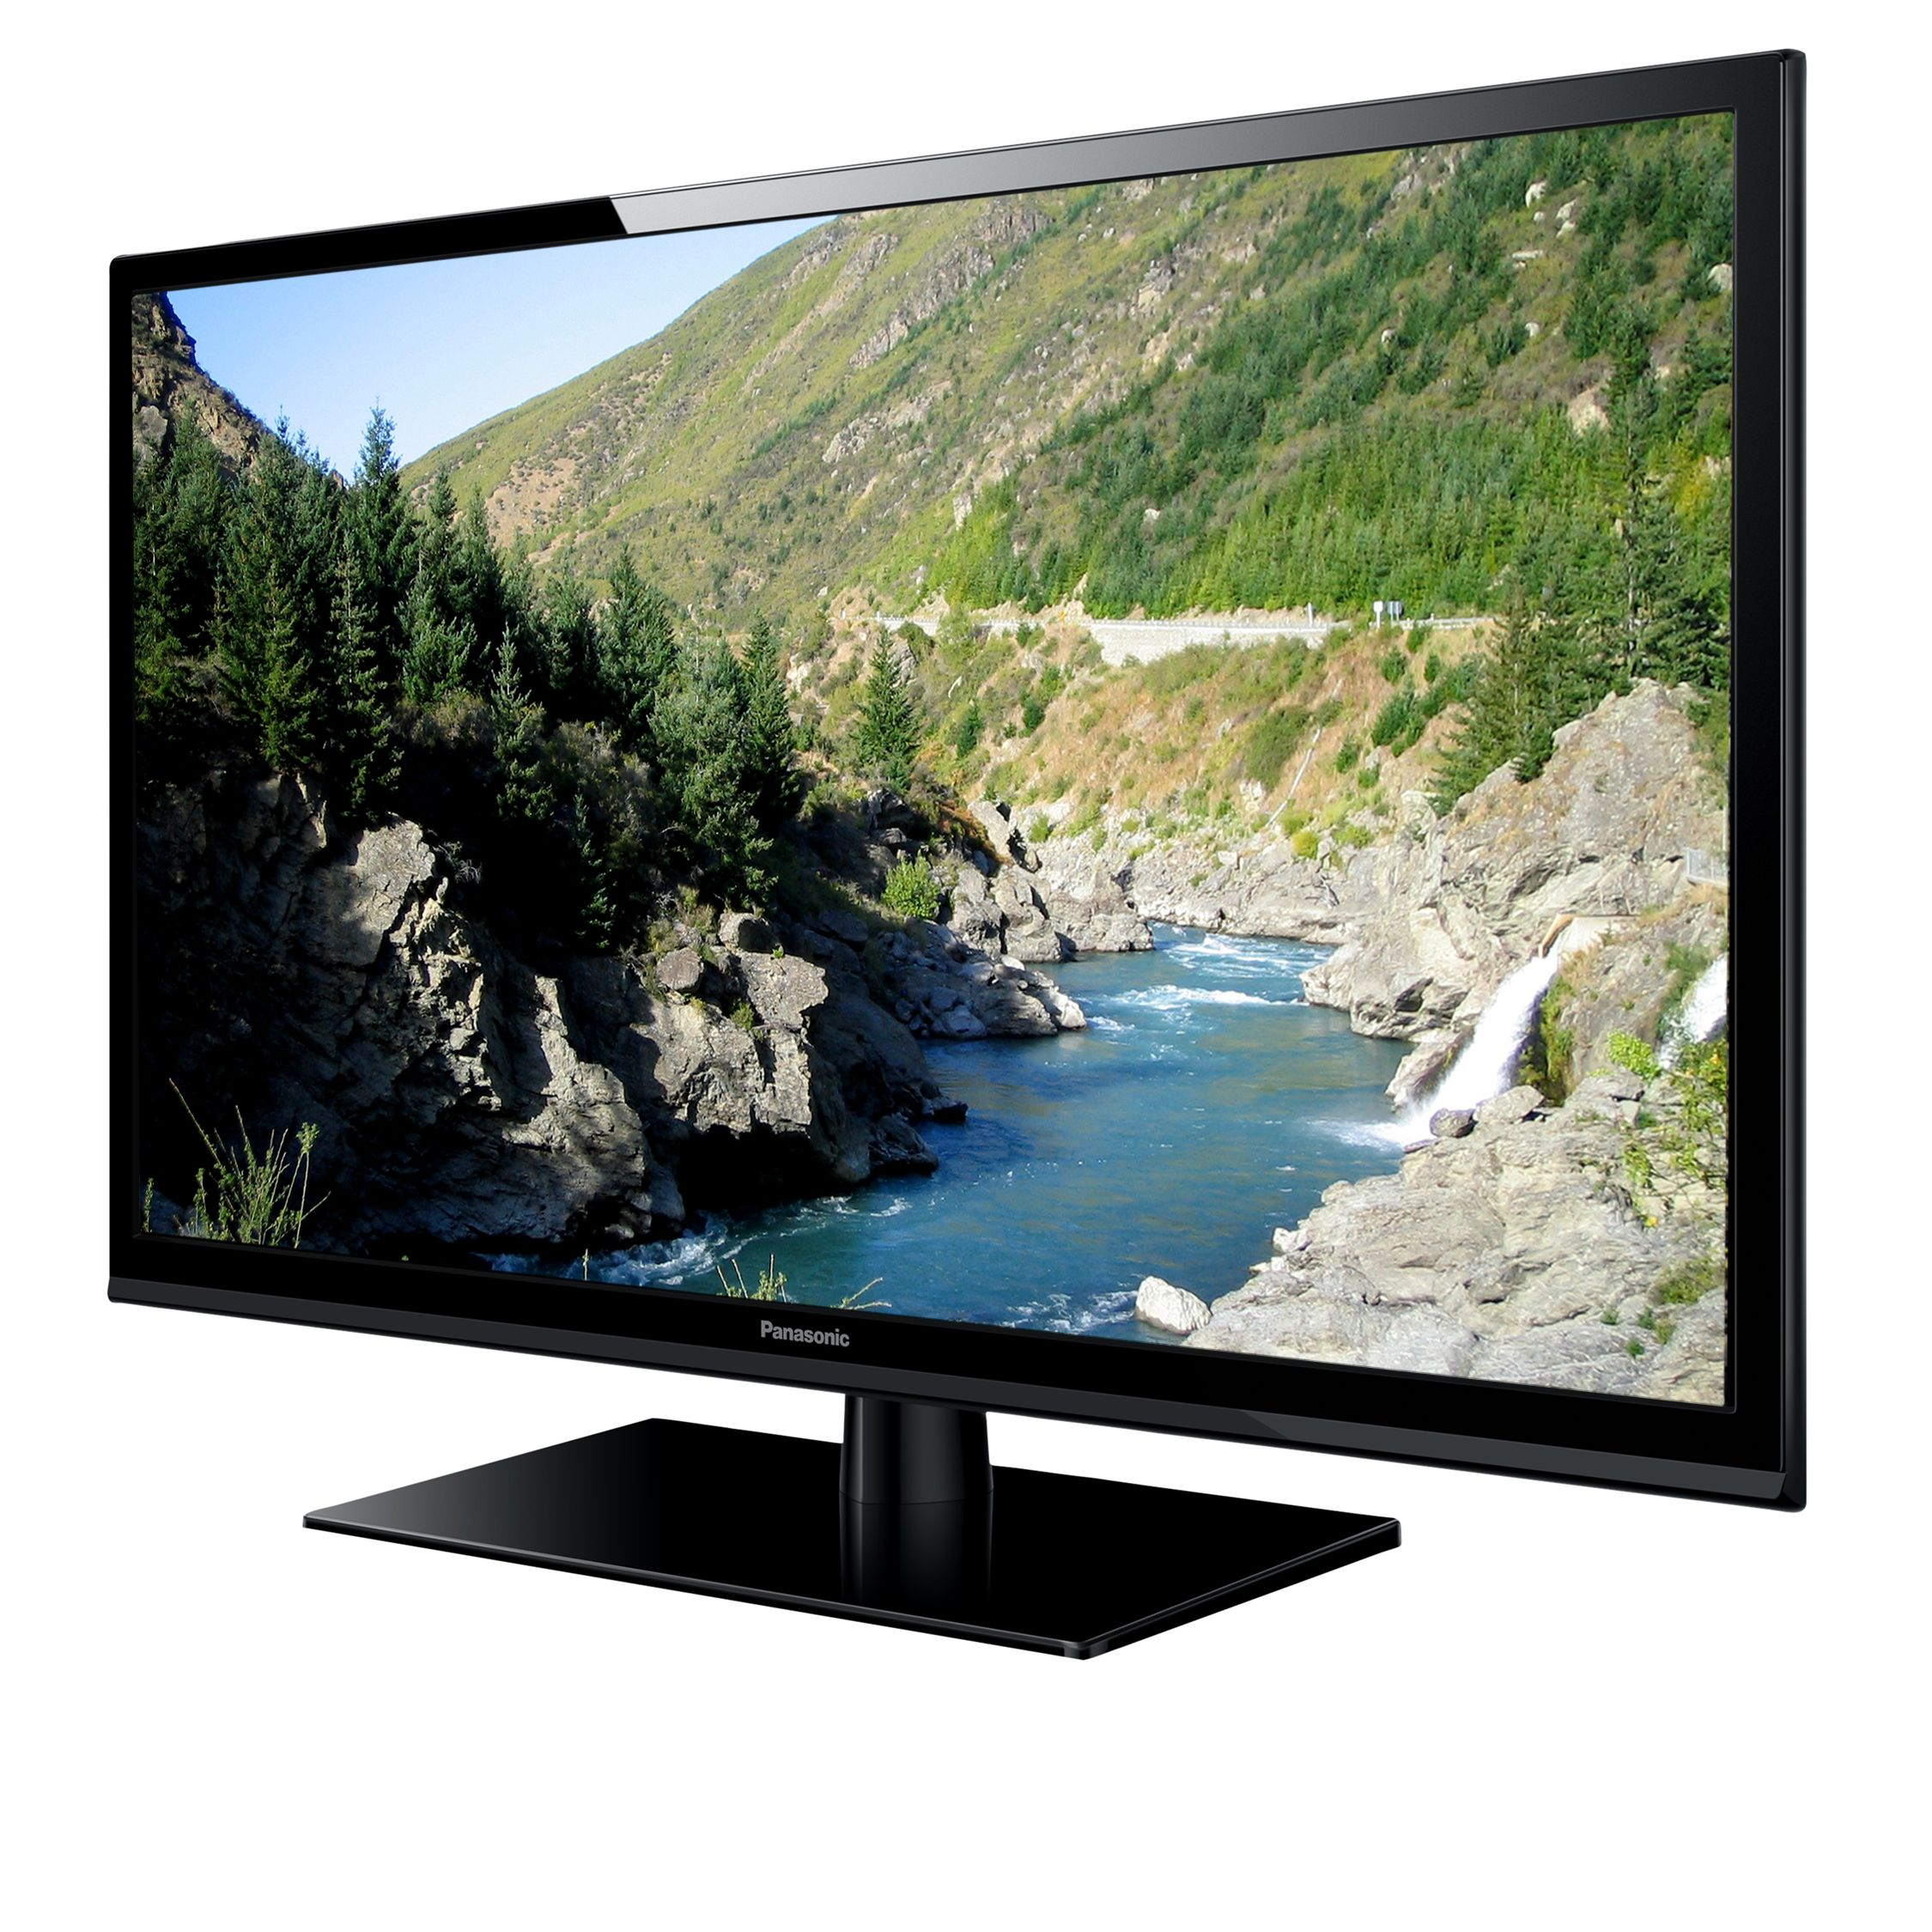 Panasonic Viera TXL19XM6B HD 720p LED TV 19&quot with Freeview HD